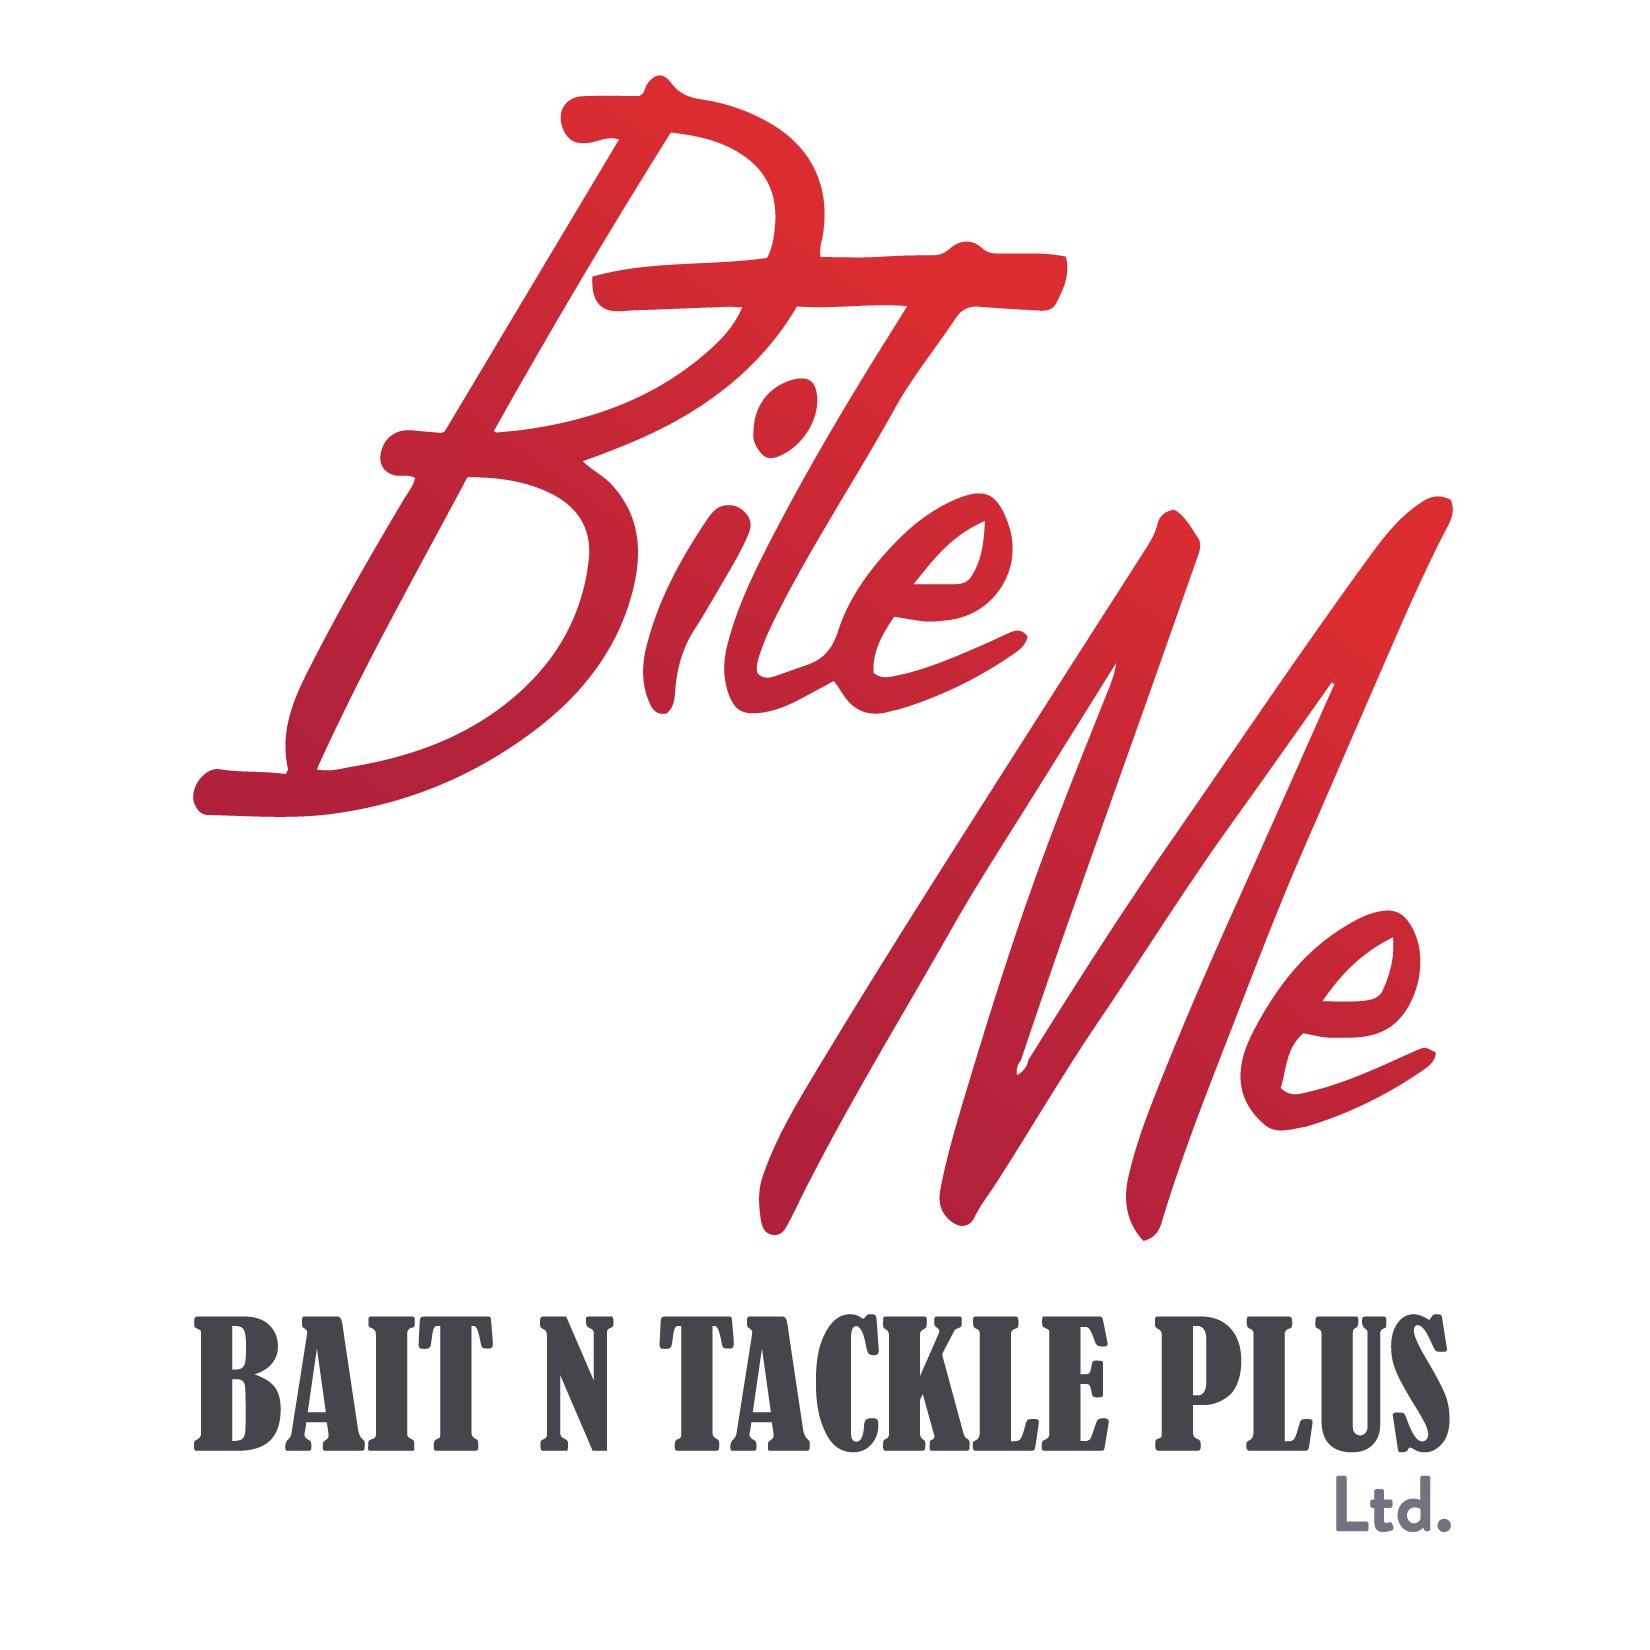 Bite Me Bait N Tackle Plus Ltd.